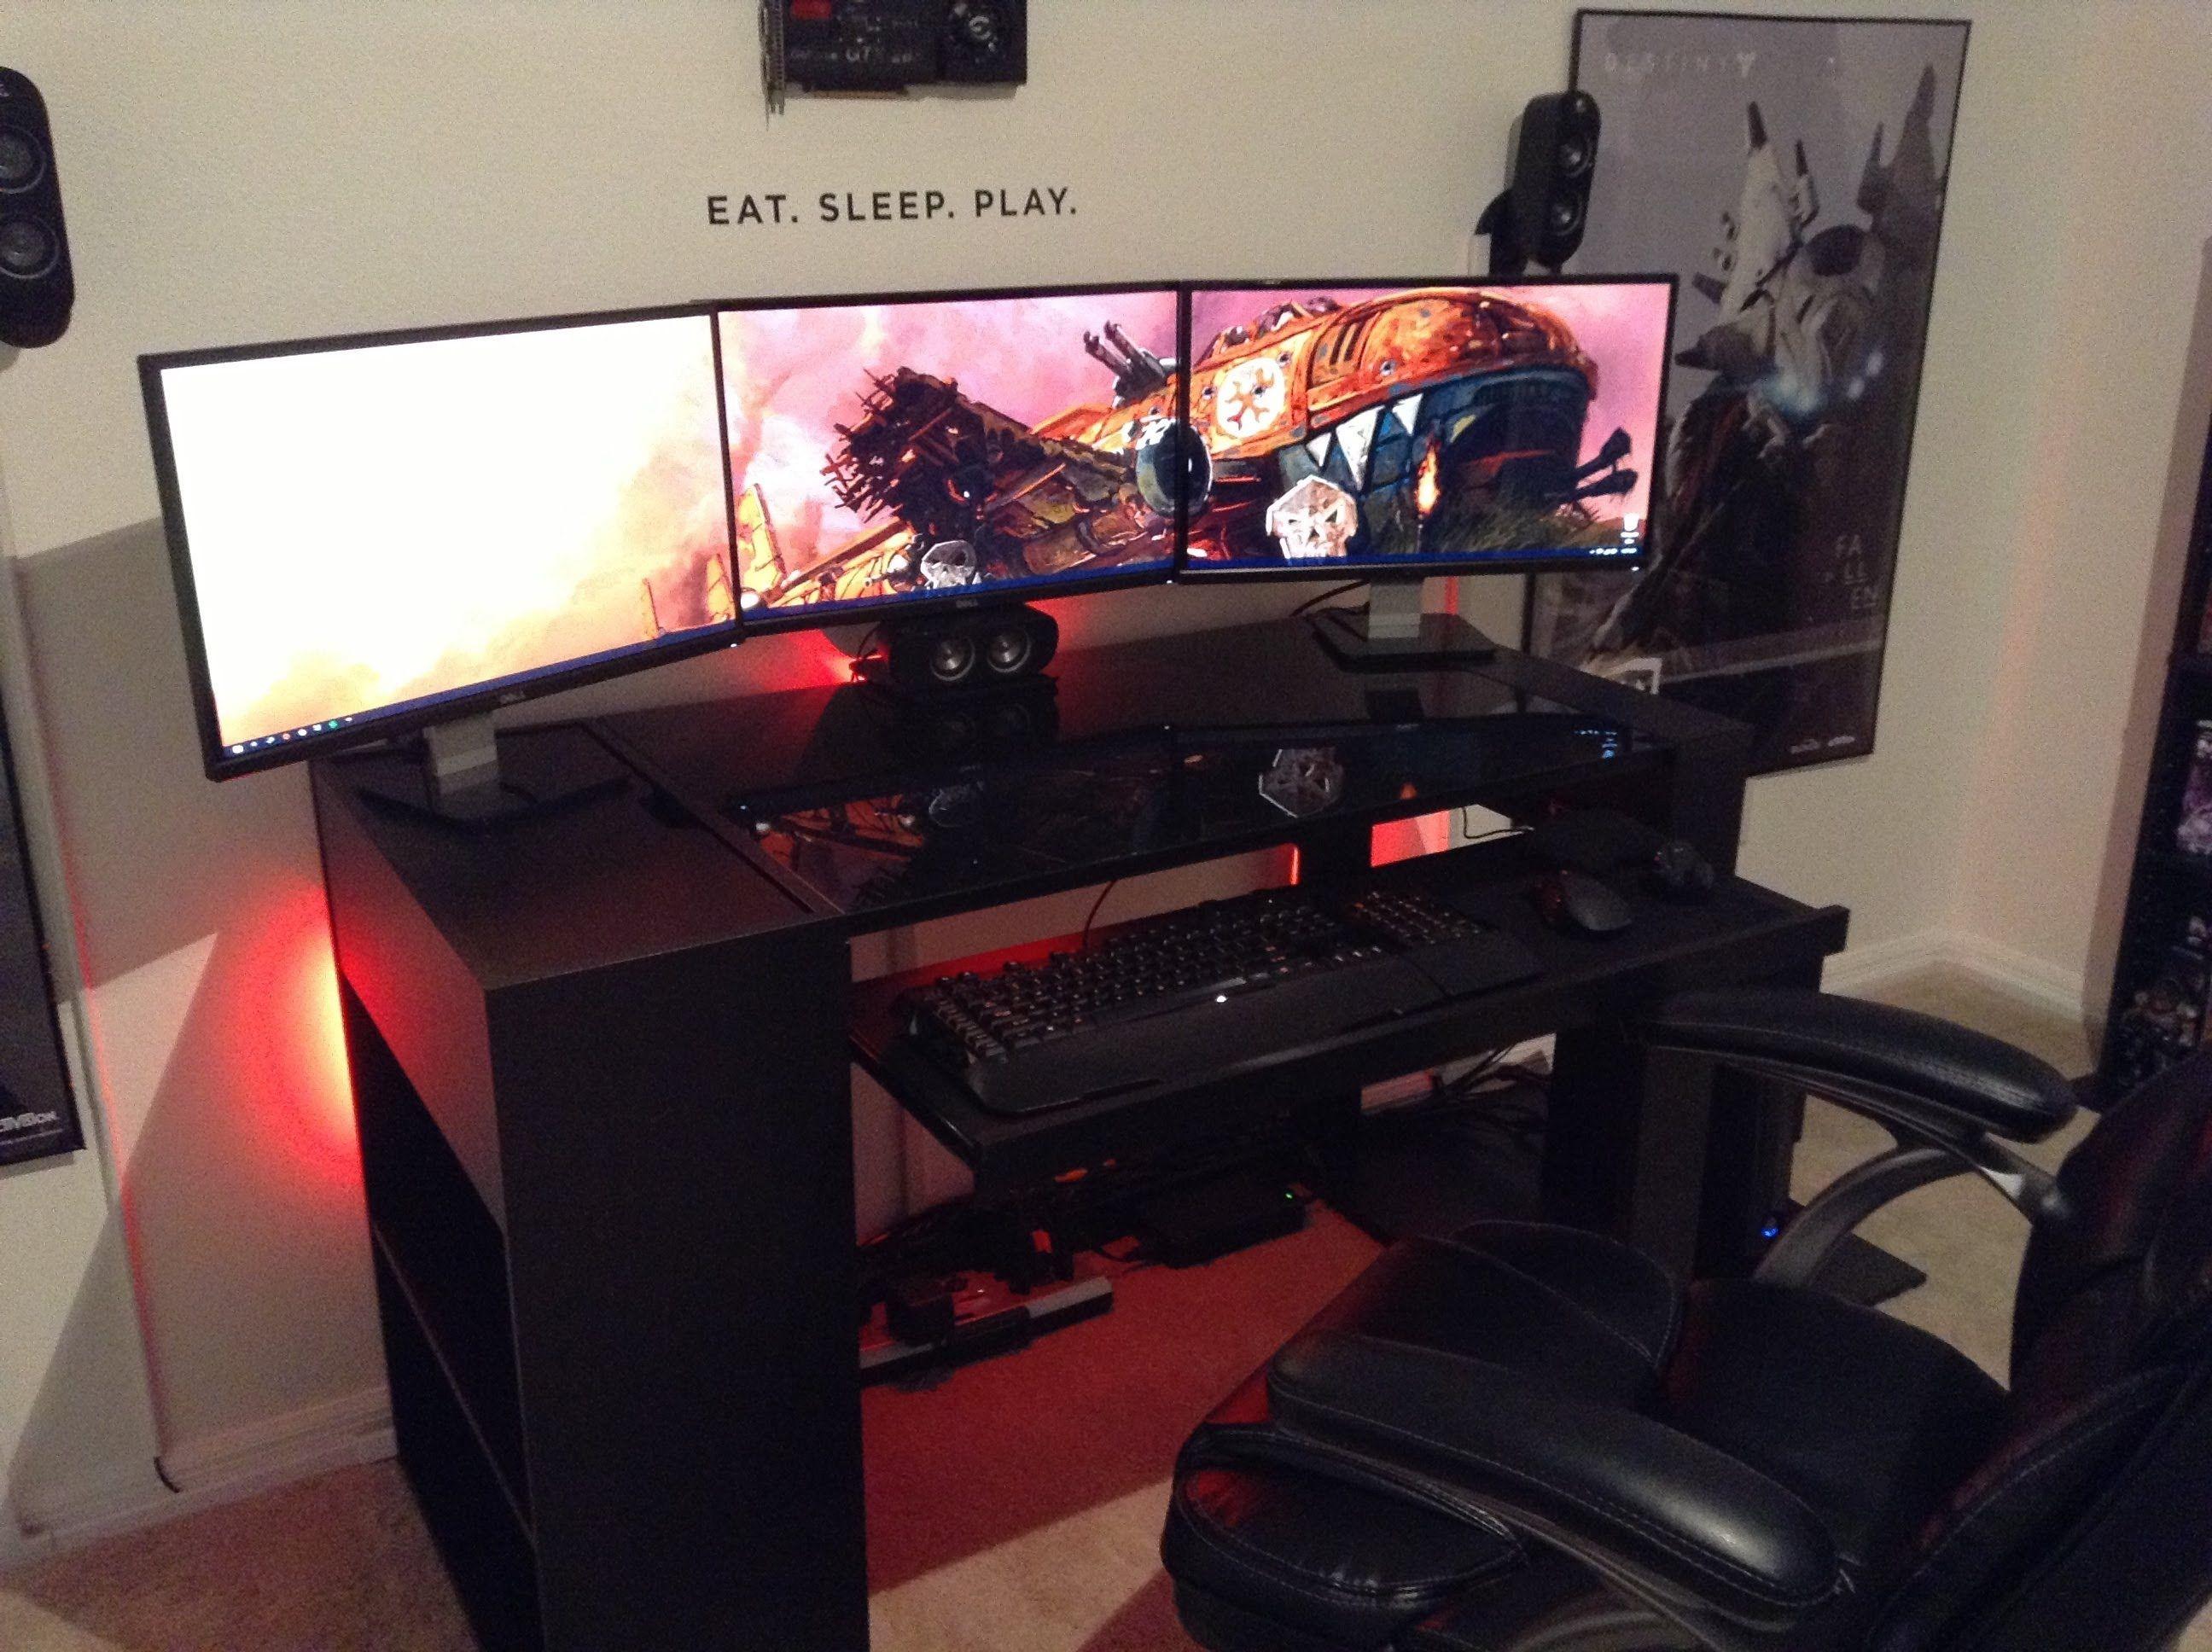 cool-gaming-setups-hd-background-9.jpg (2592×1936) | Gaming report ...